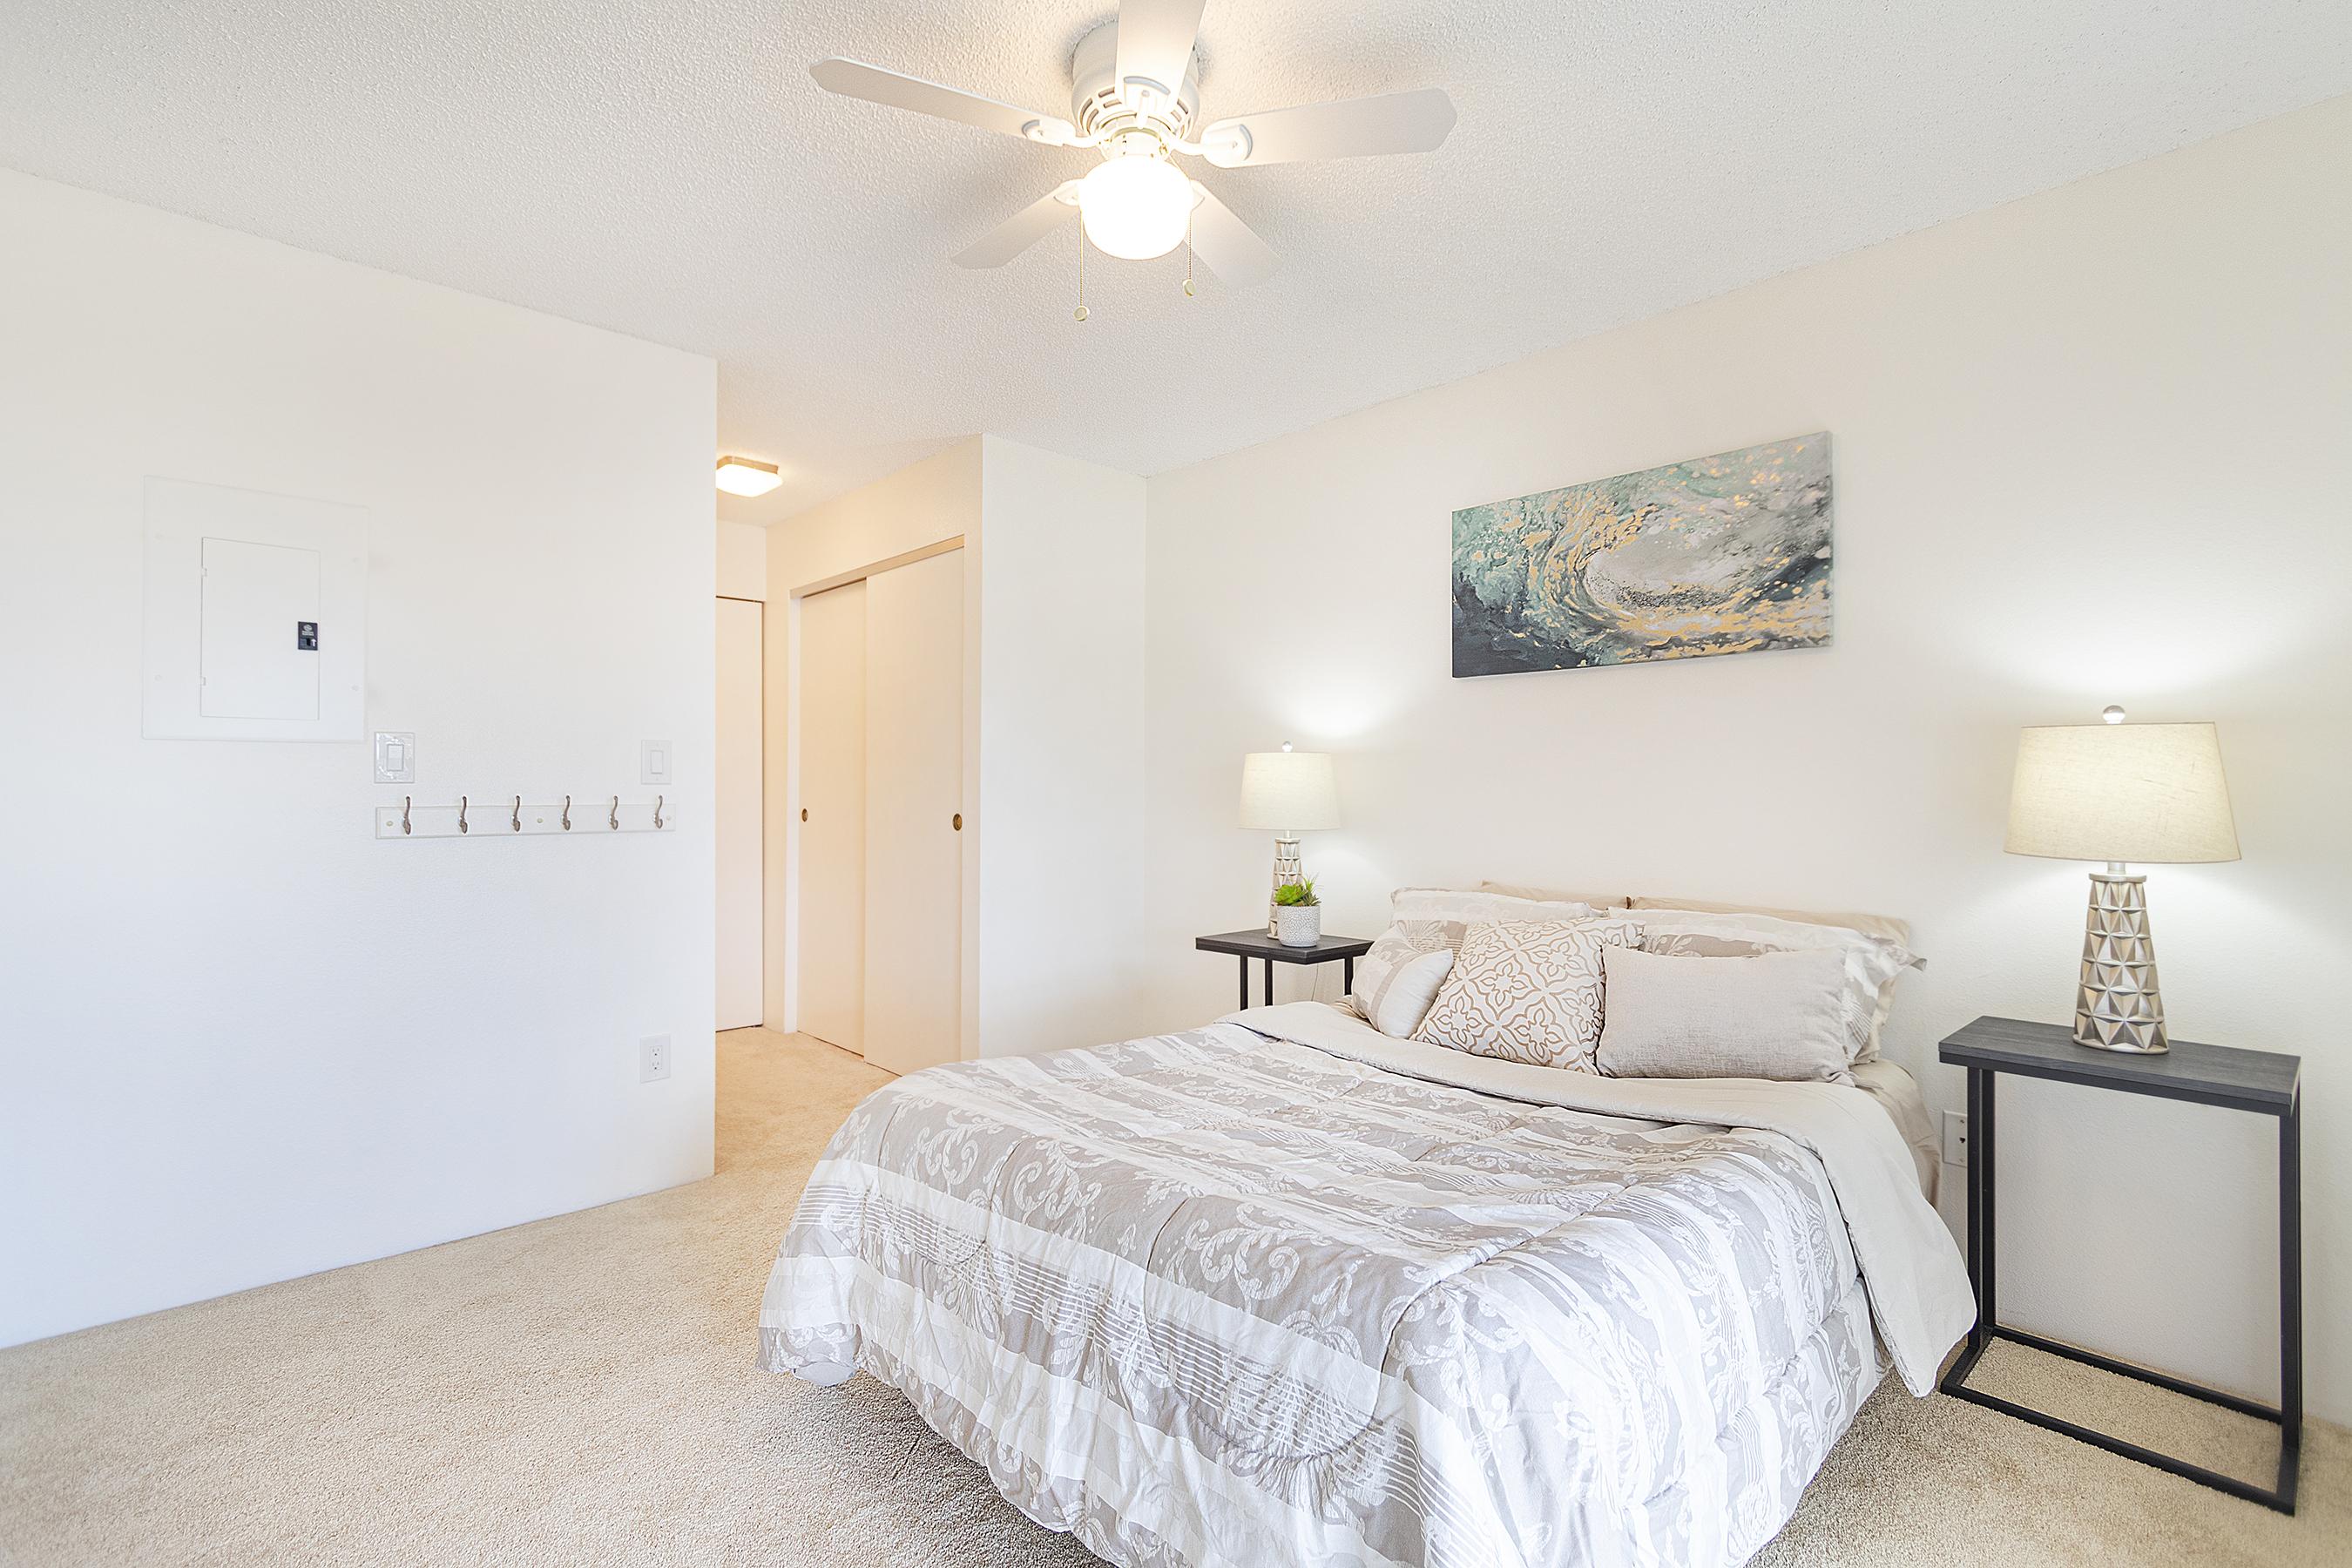 Master bed and view of closet at 94-870 Lumiauau St #Y201